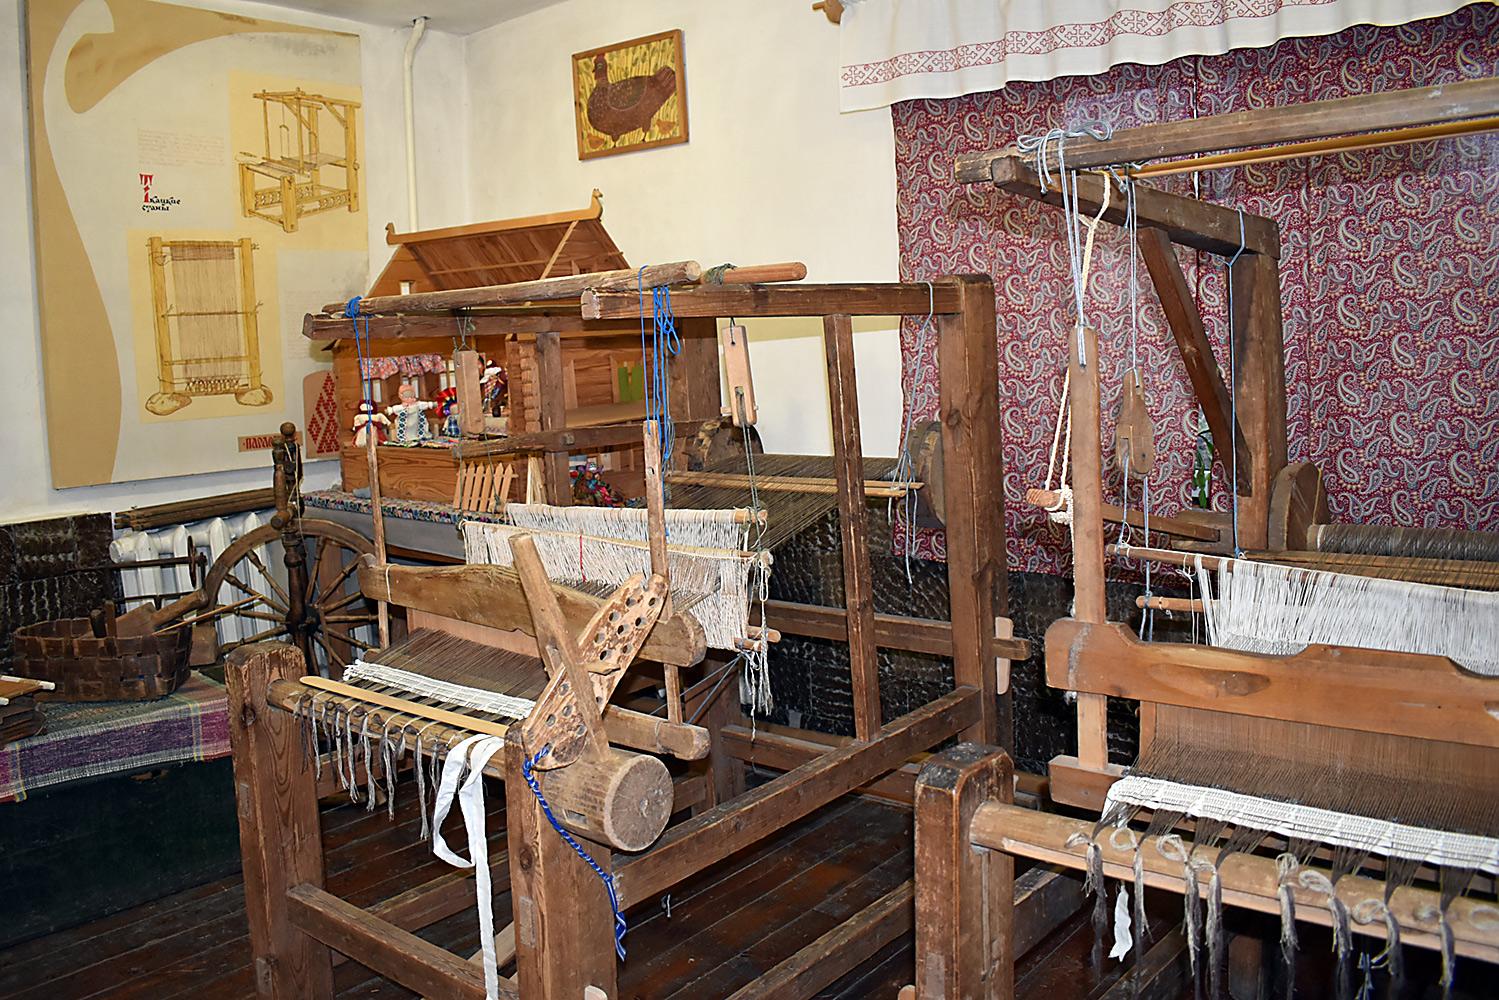 Школа традиционной культуры «Параскева»